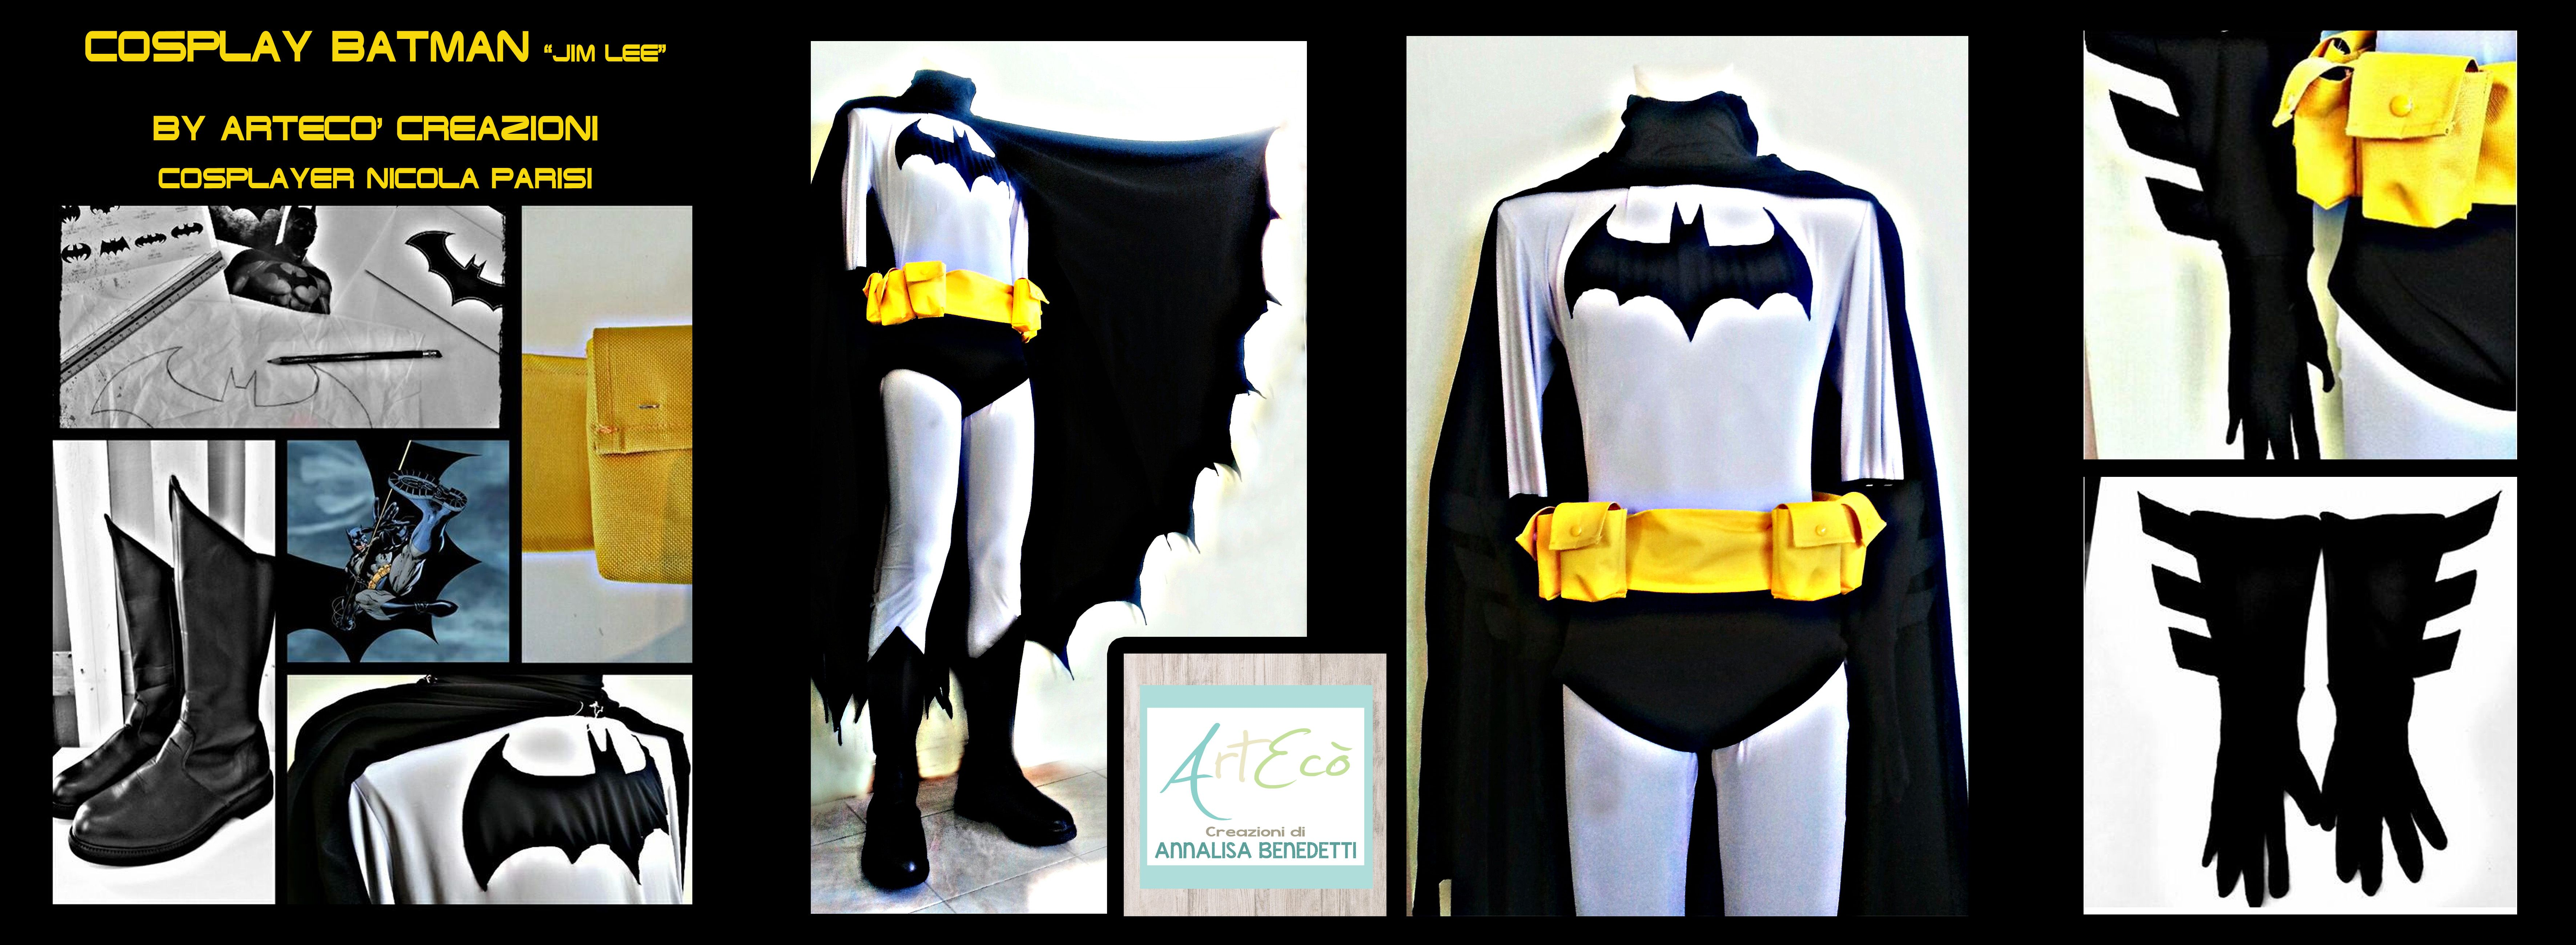 Cosplay BATMAN (Jim Lee)   Style & Handmade by ArtEcò Creazioni di Annalisa Benedetti  #artecòcreazioni #annalisabenedetti #cosplay #cosplayer #batman #jimlee